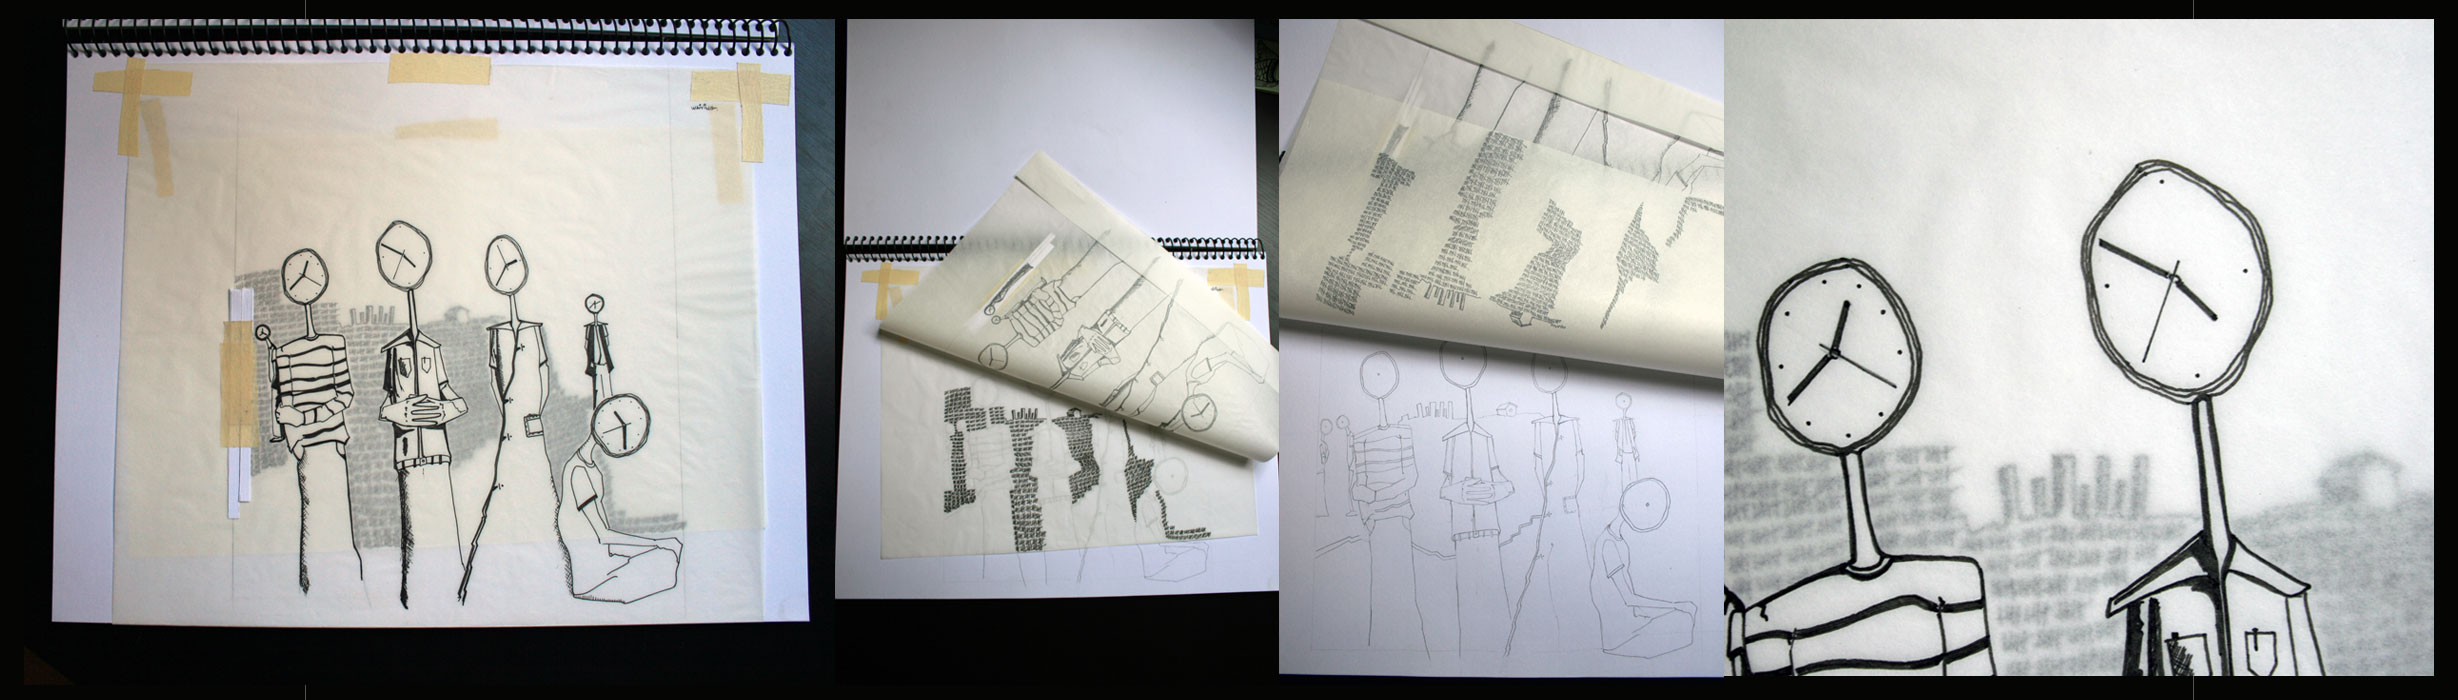 04_asrc_waiting_illustration